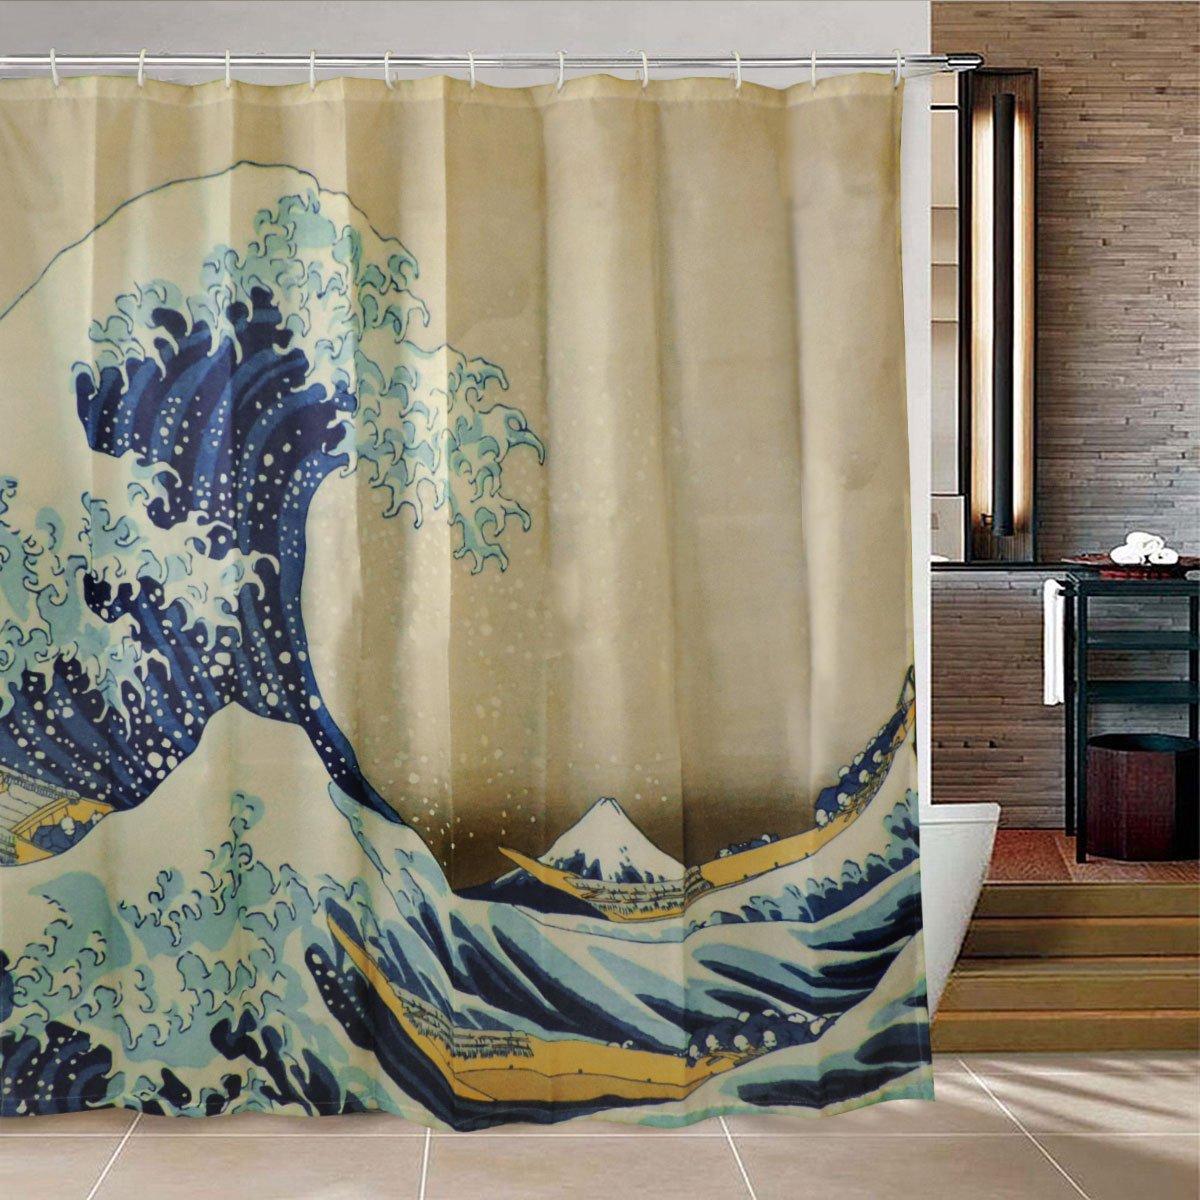 Bathroom Shower Curtain Wave Shower Curtain Durable Bath Curtain, The Great Wave Off Kanagawa by Katsushika Hokusai Shower Curtain Thirty-six Views of Mount Fuji Bathroom Curtain